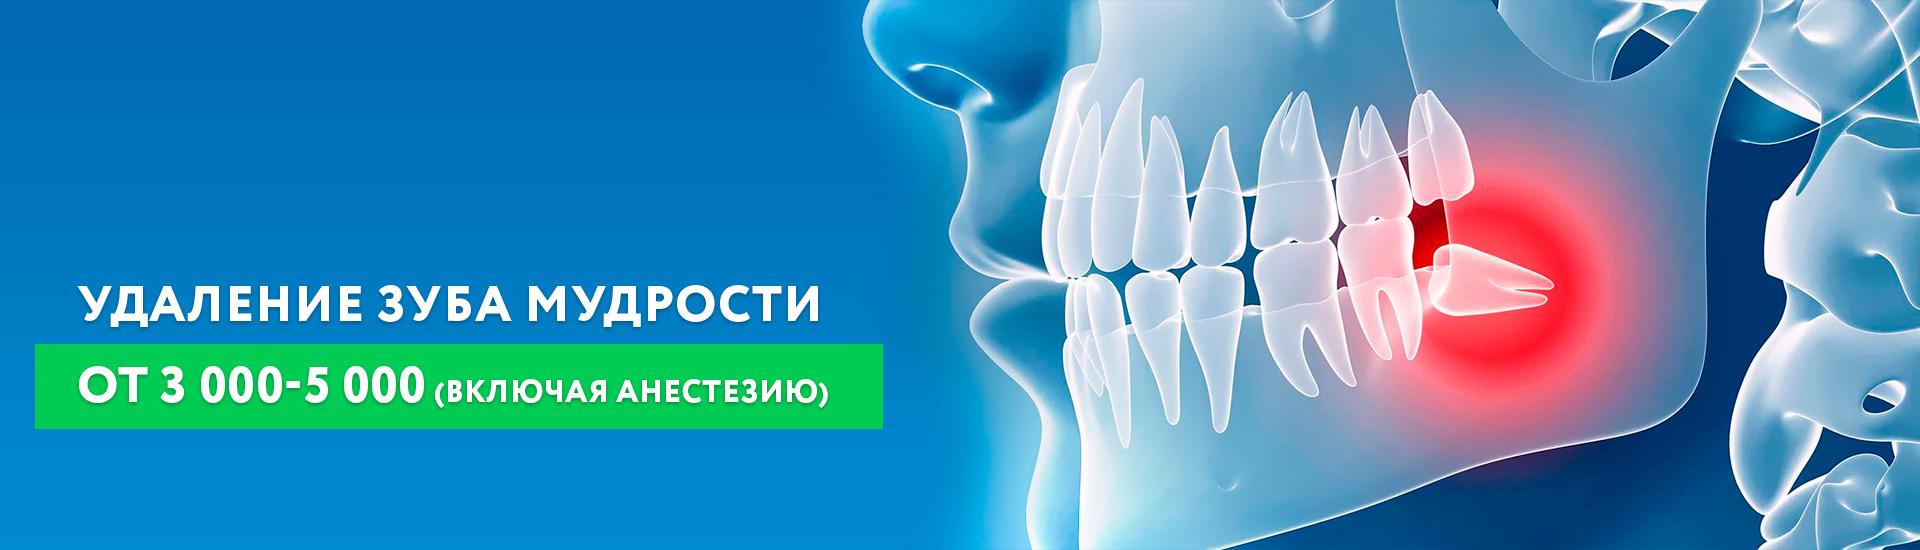 Удаление зуба мудрости от 3000-5000